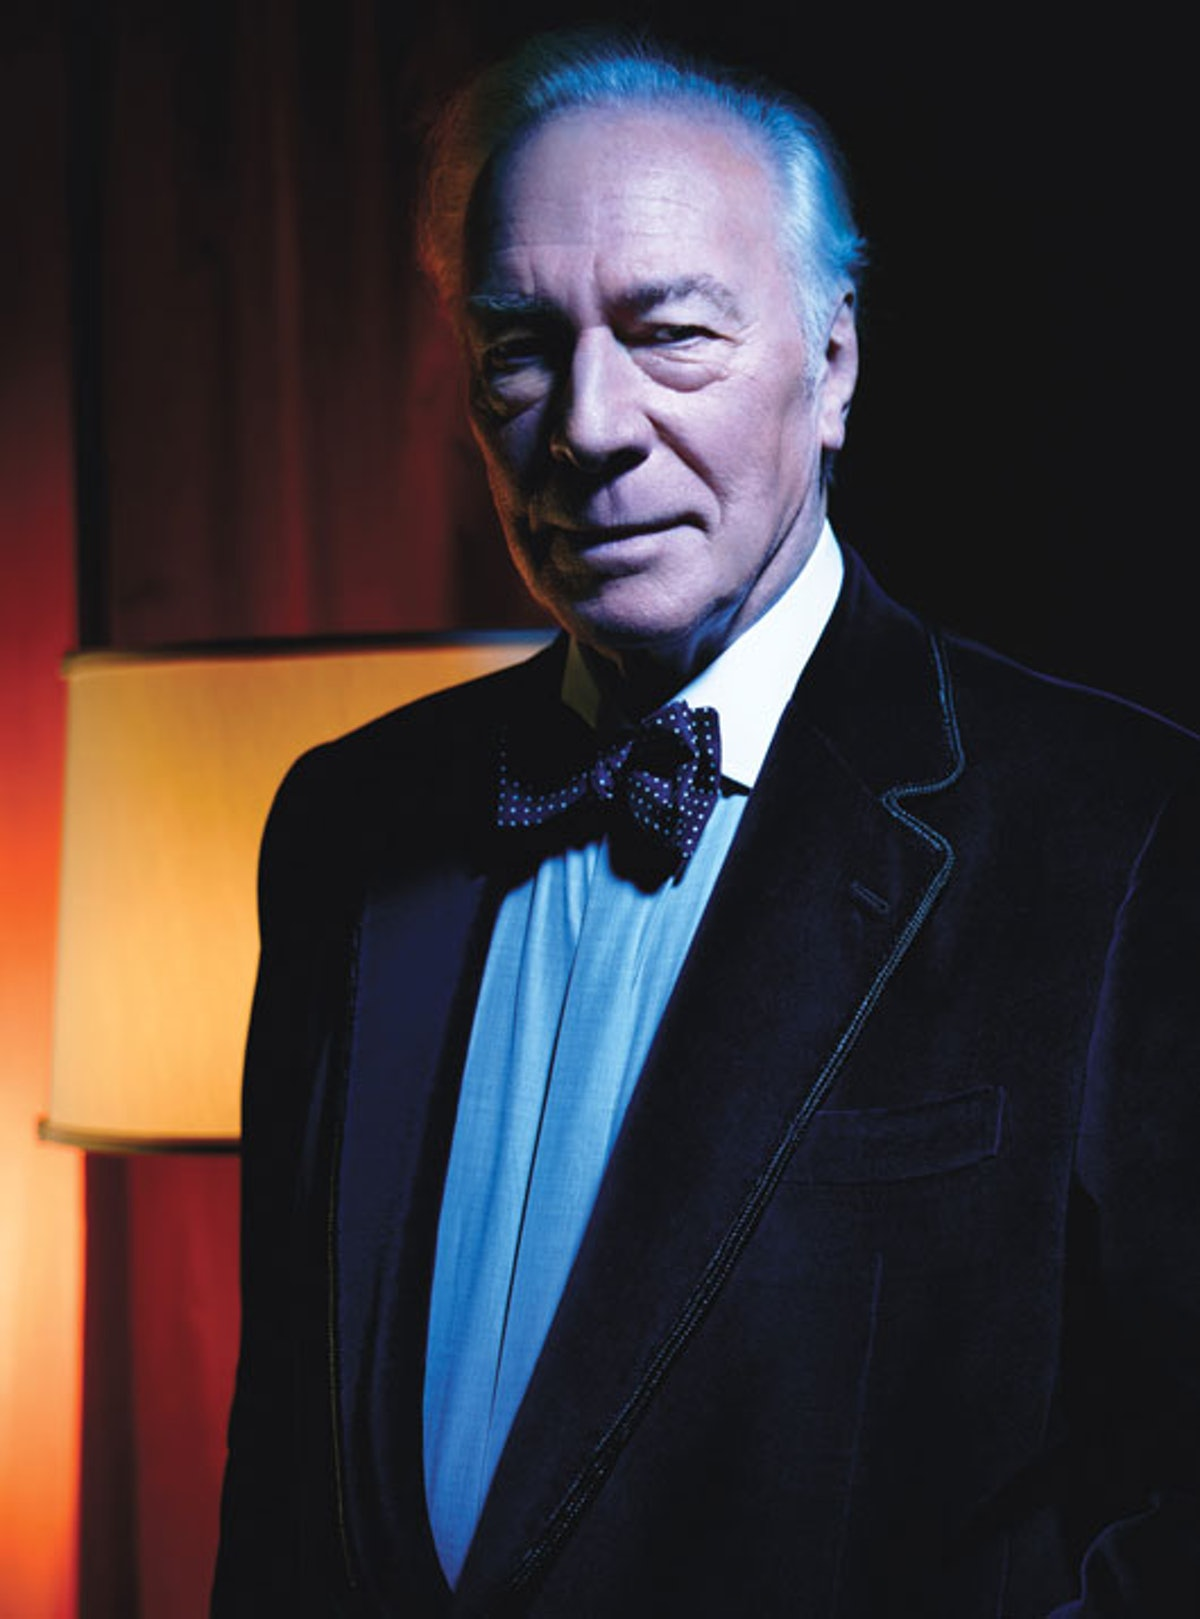 cess-best-performances-actor-portfolio-2012-15-l.jpg